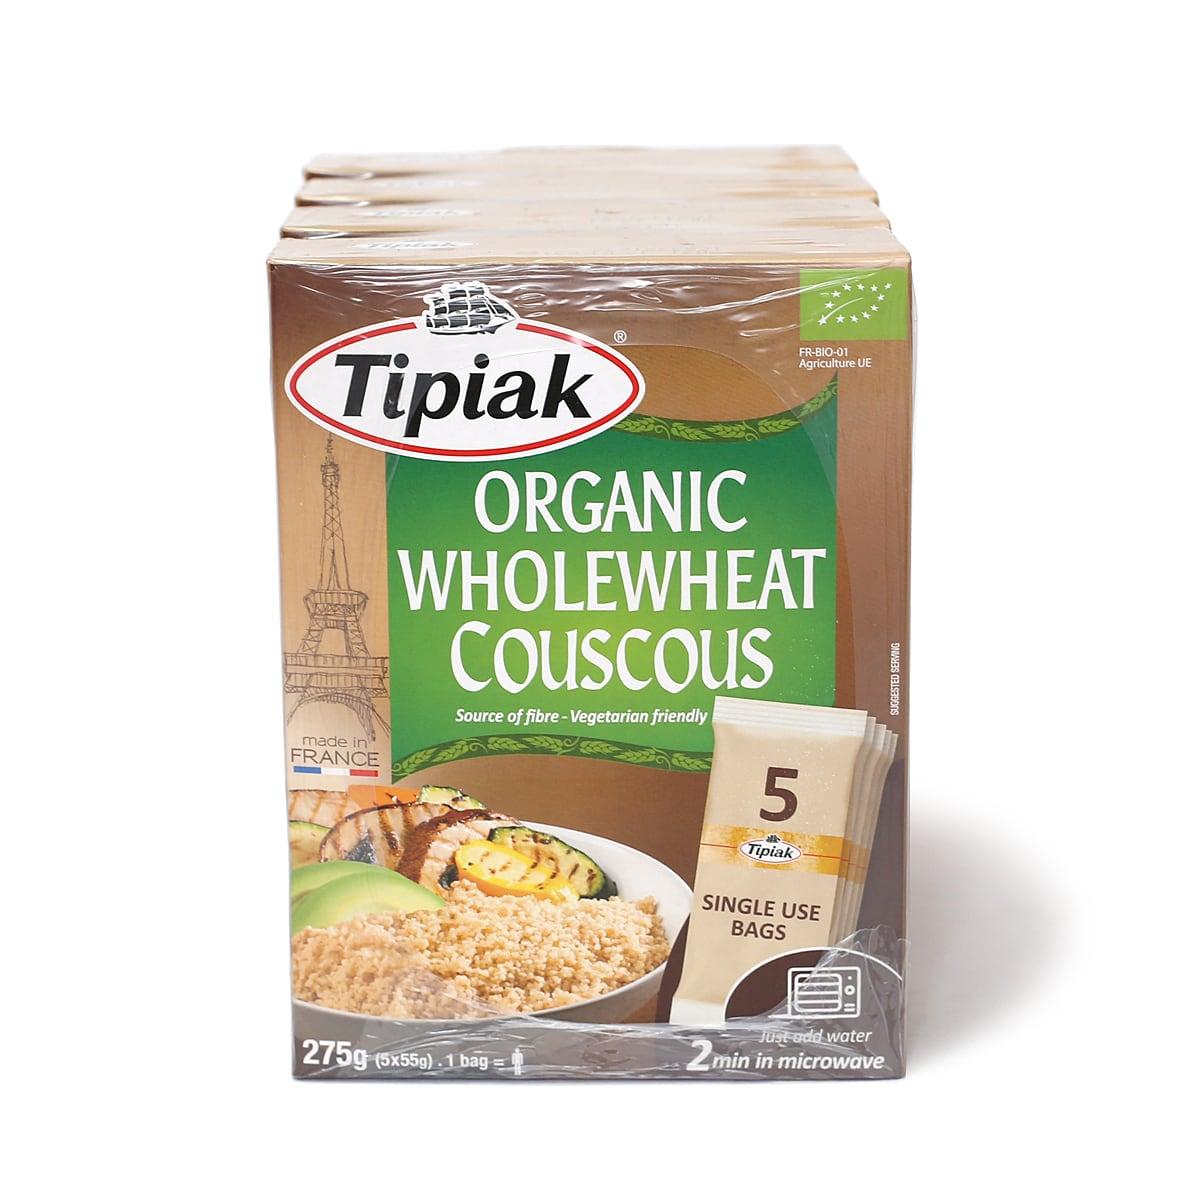 Tipiak オーガニックホールウィートクスクス 275g×4箱